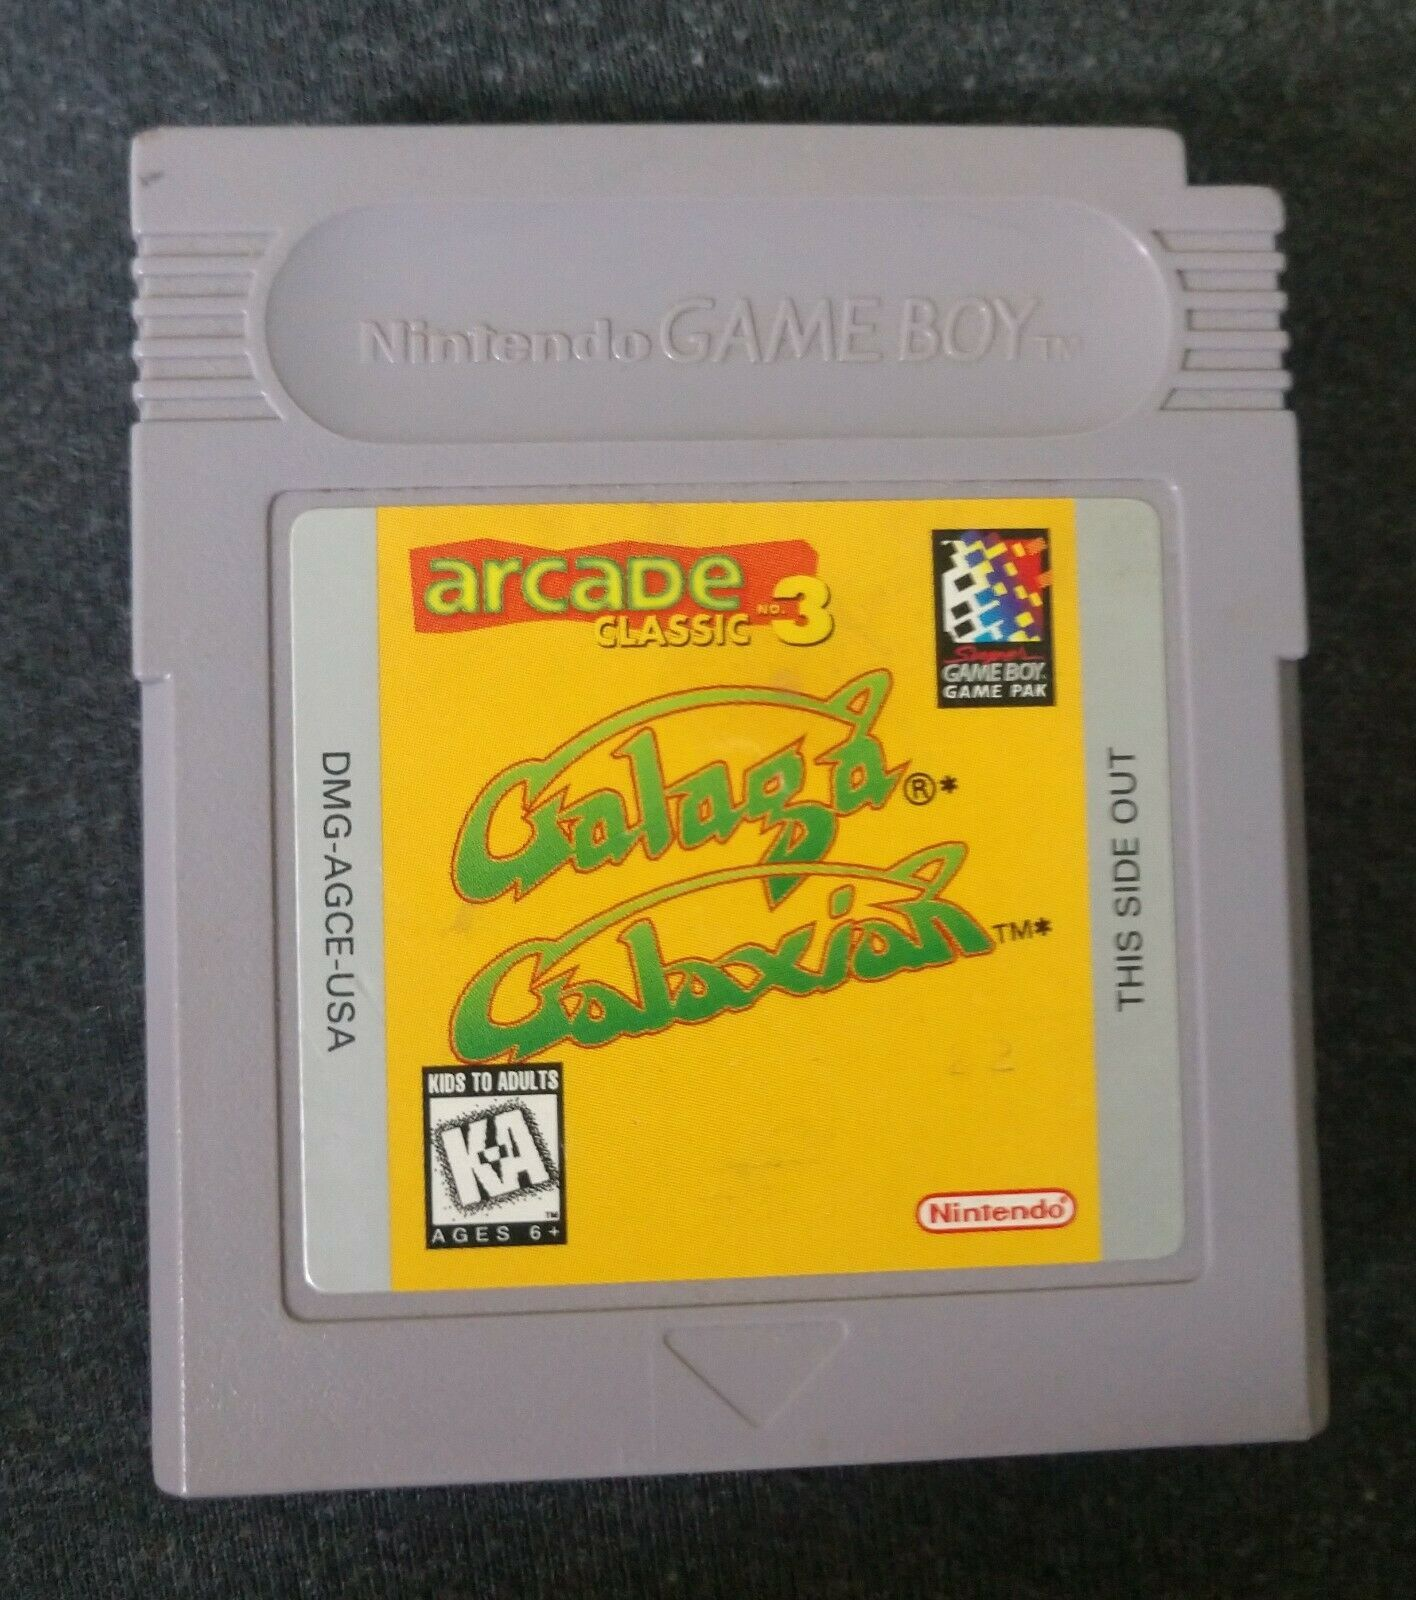 Arcade Classic 3 - Galaga & Galaxian - Nintendo Game Boy